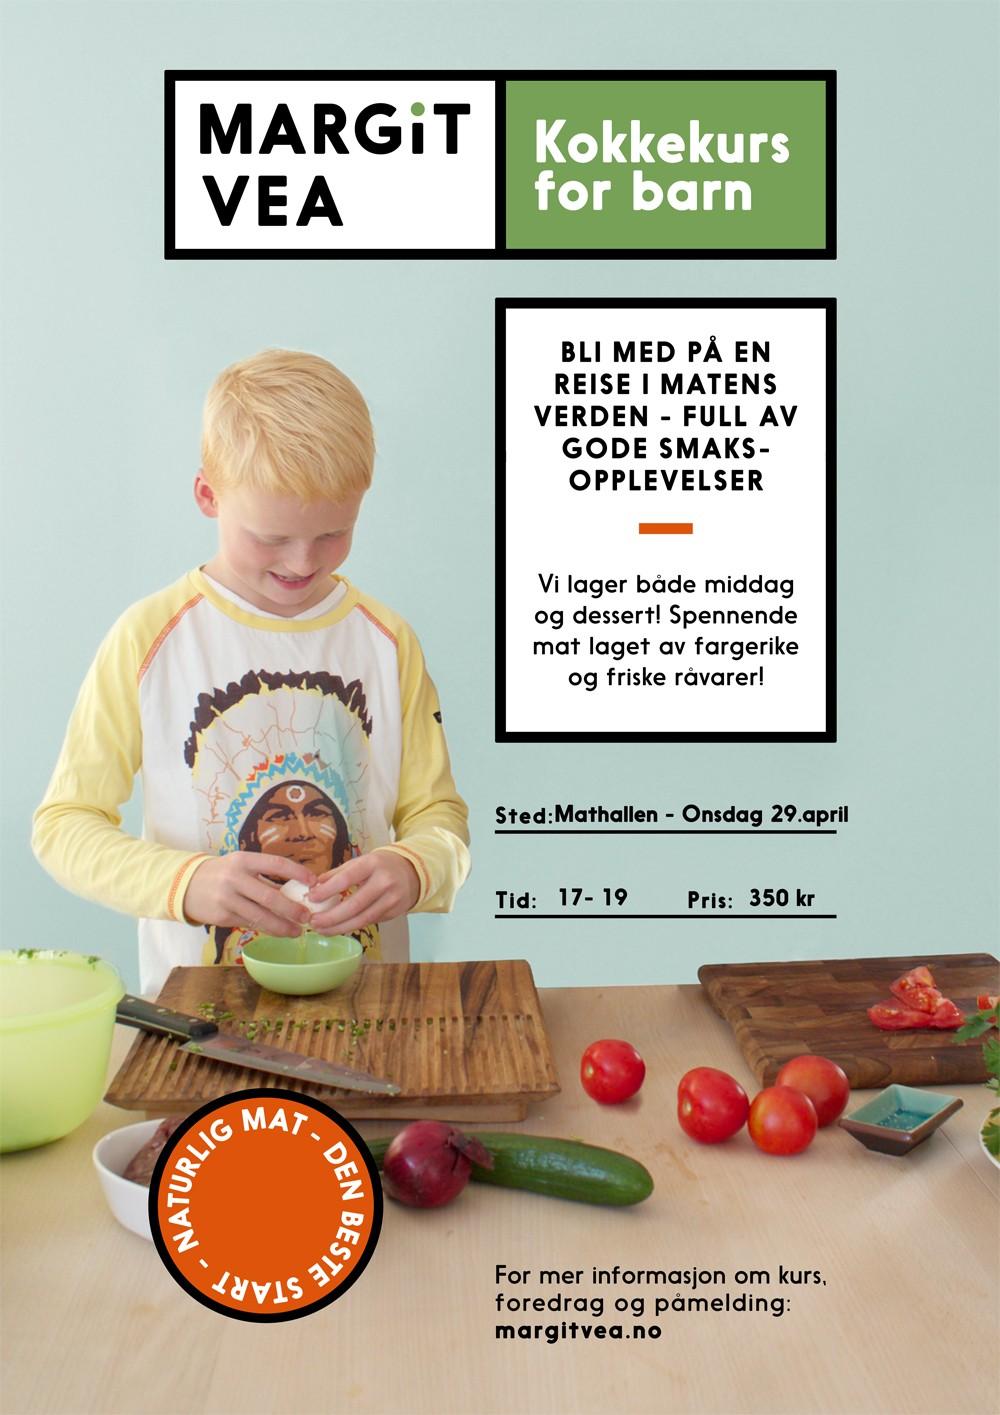 Kokkekurs barn oslo